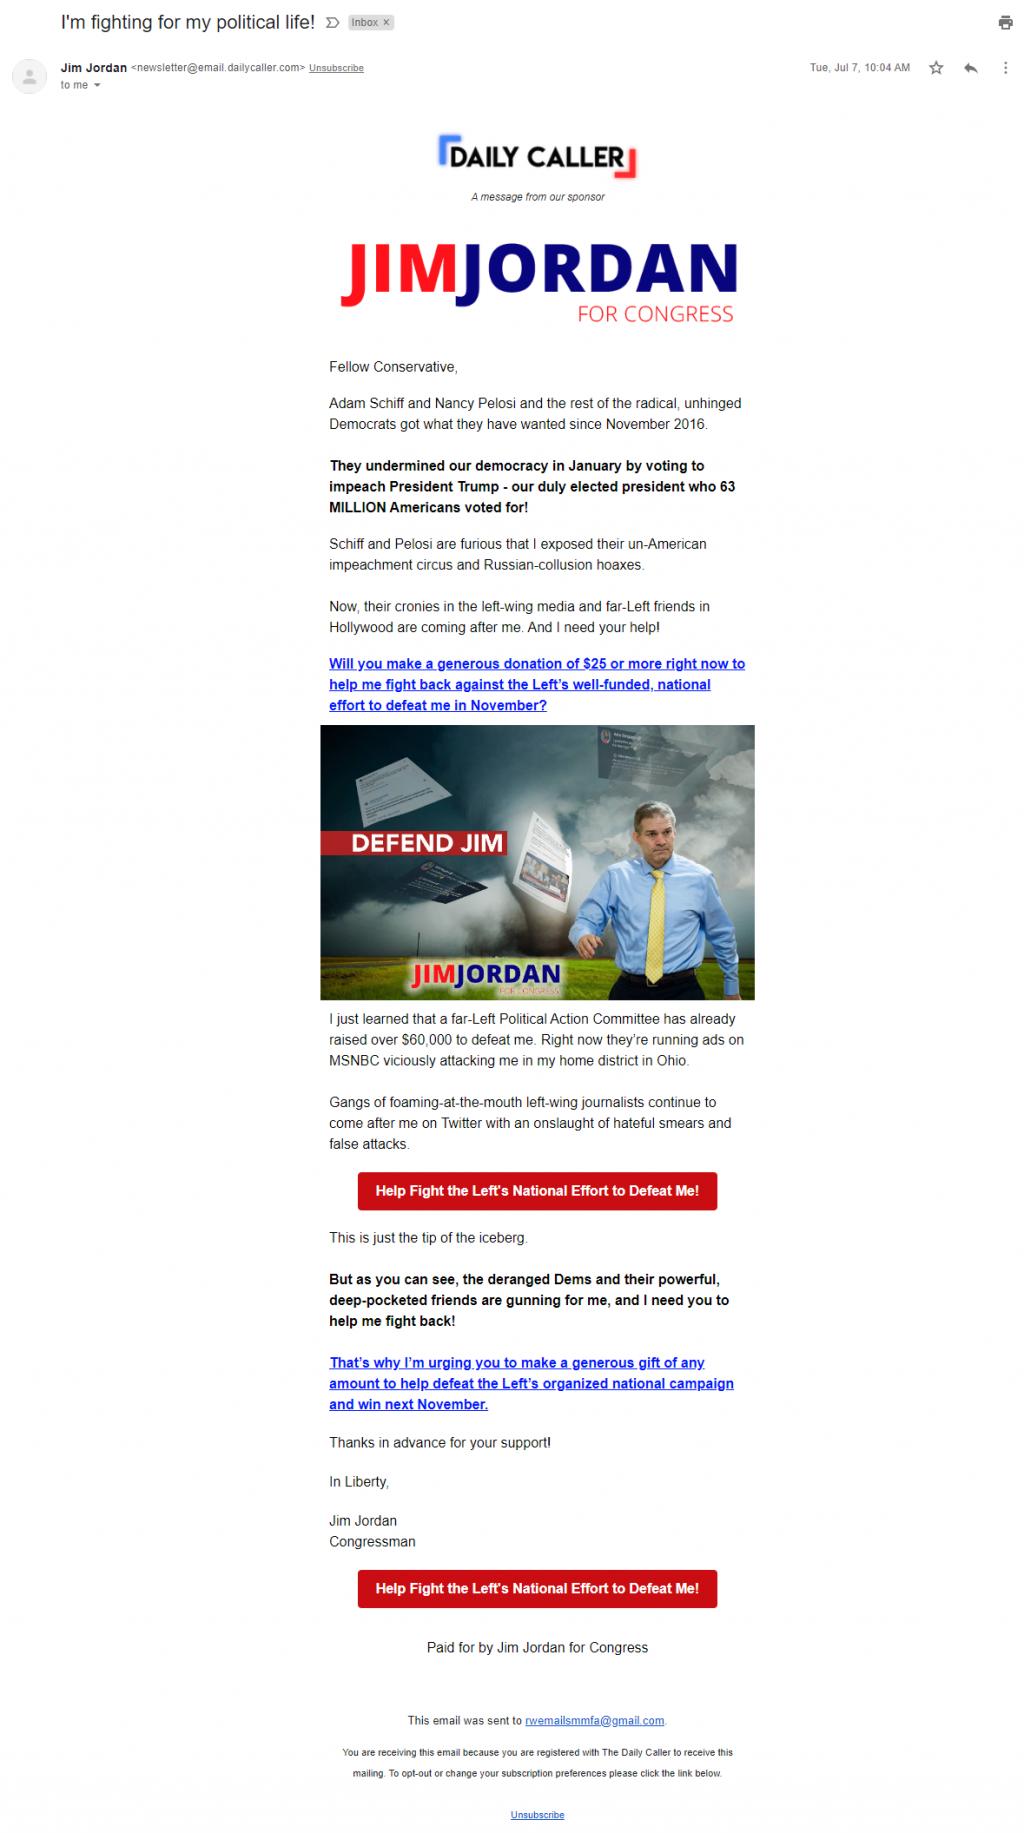 Daily Caller sponsored email for Jim Jordan